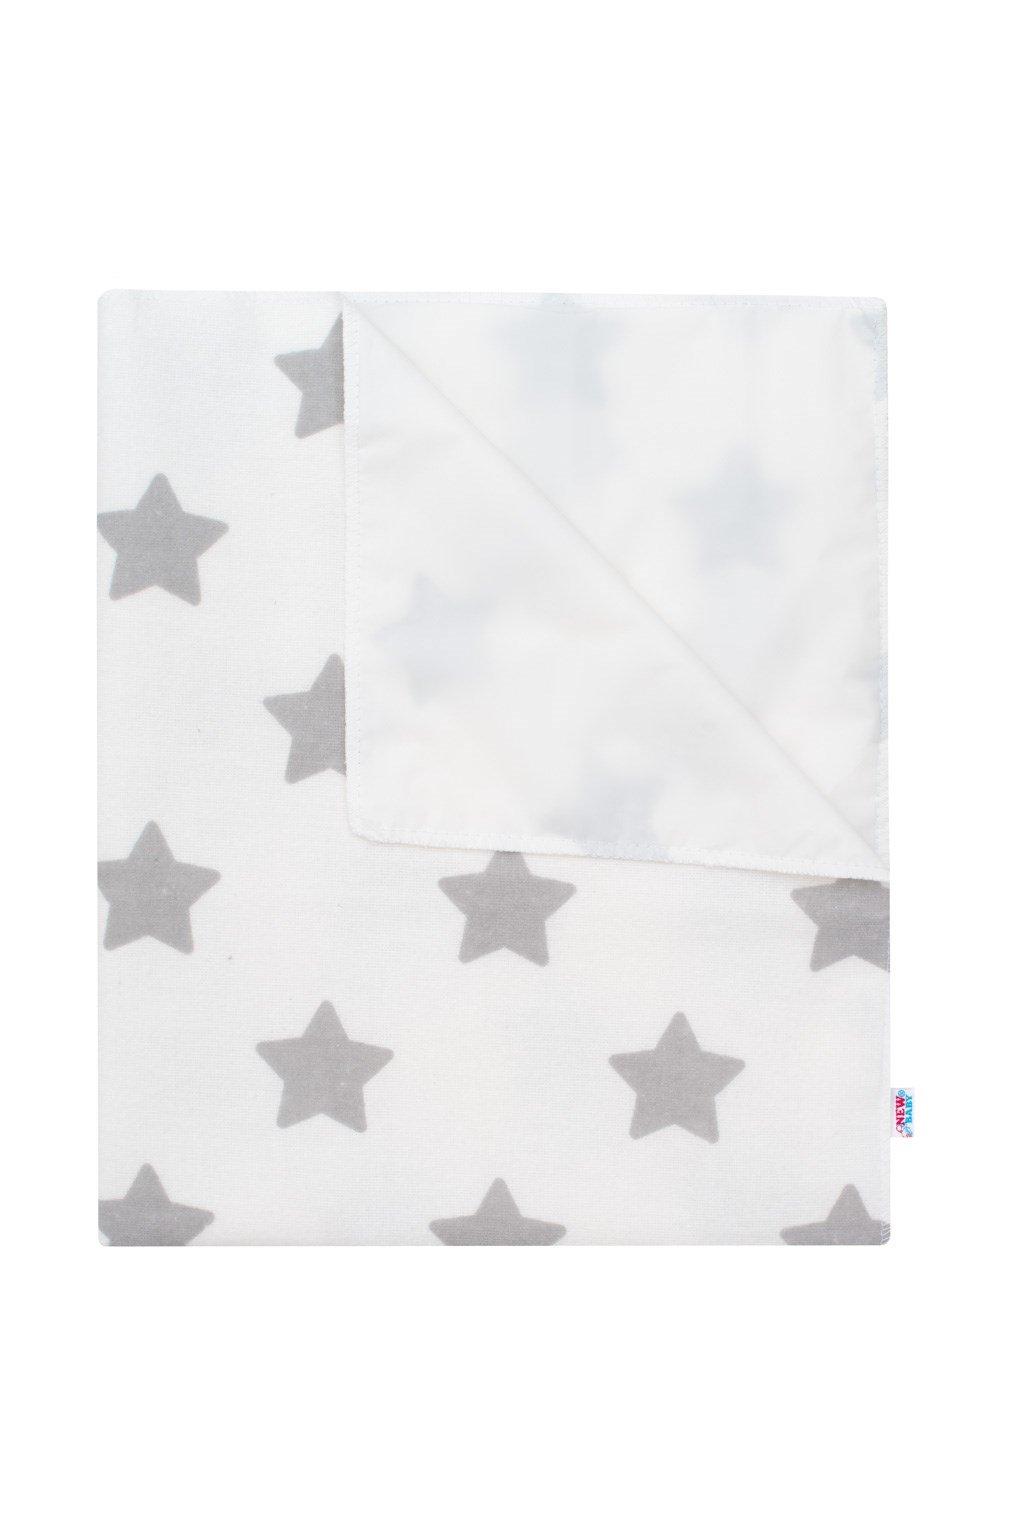 Nepremokavá flanelová podložka New Baby hviezdičky